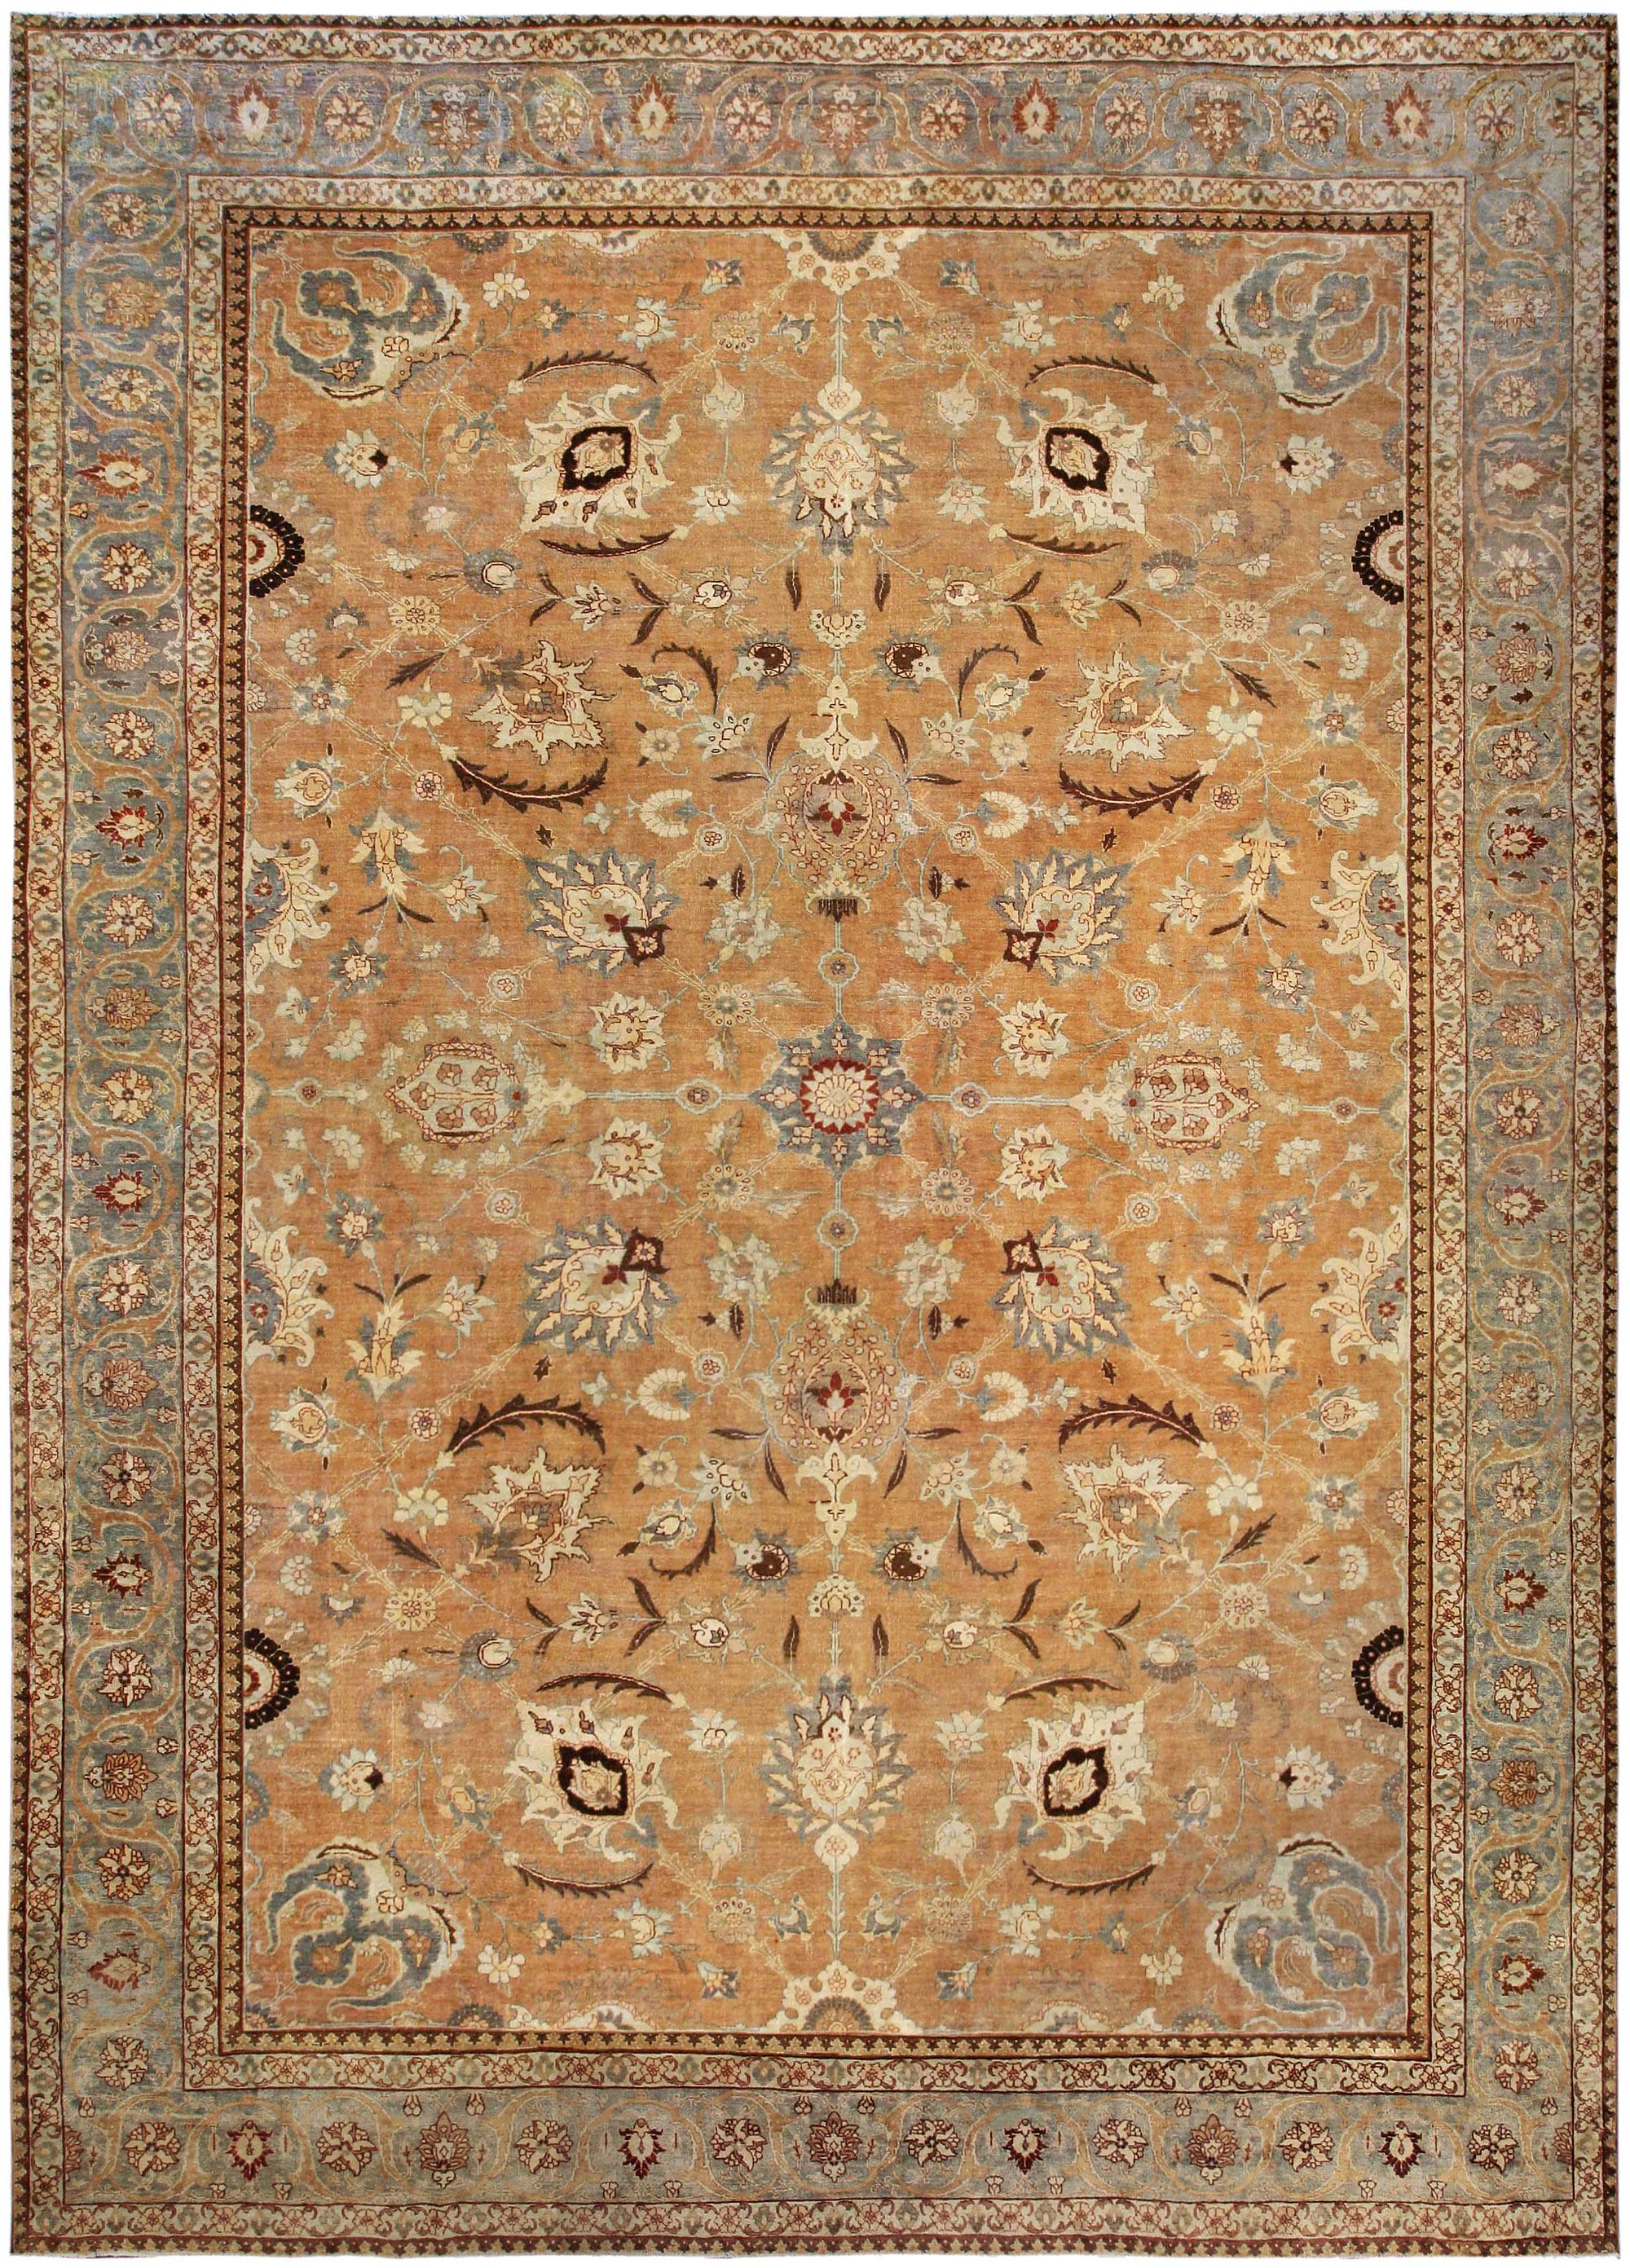 Antique Persian Tabriz Rug Bb4081 By Dlb